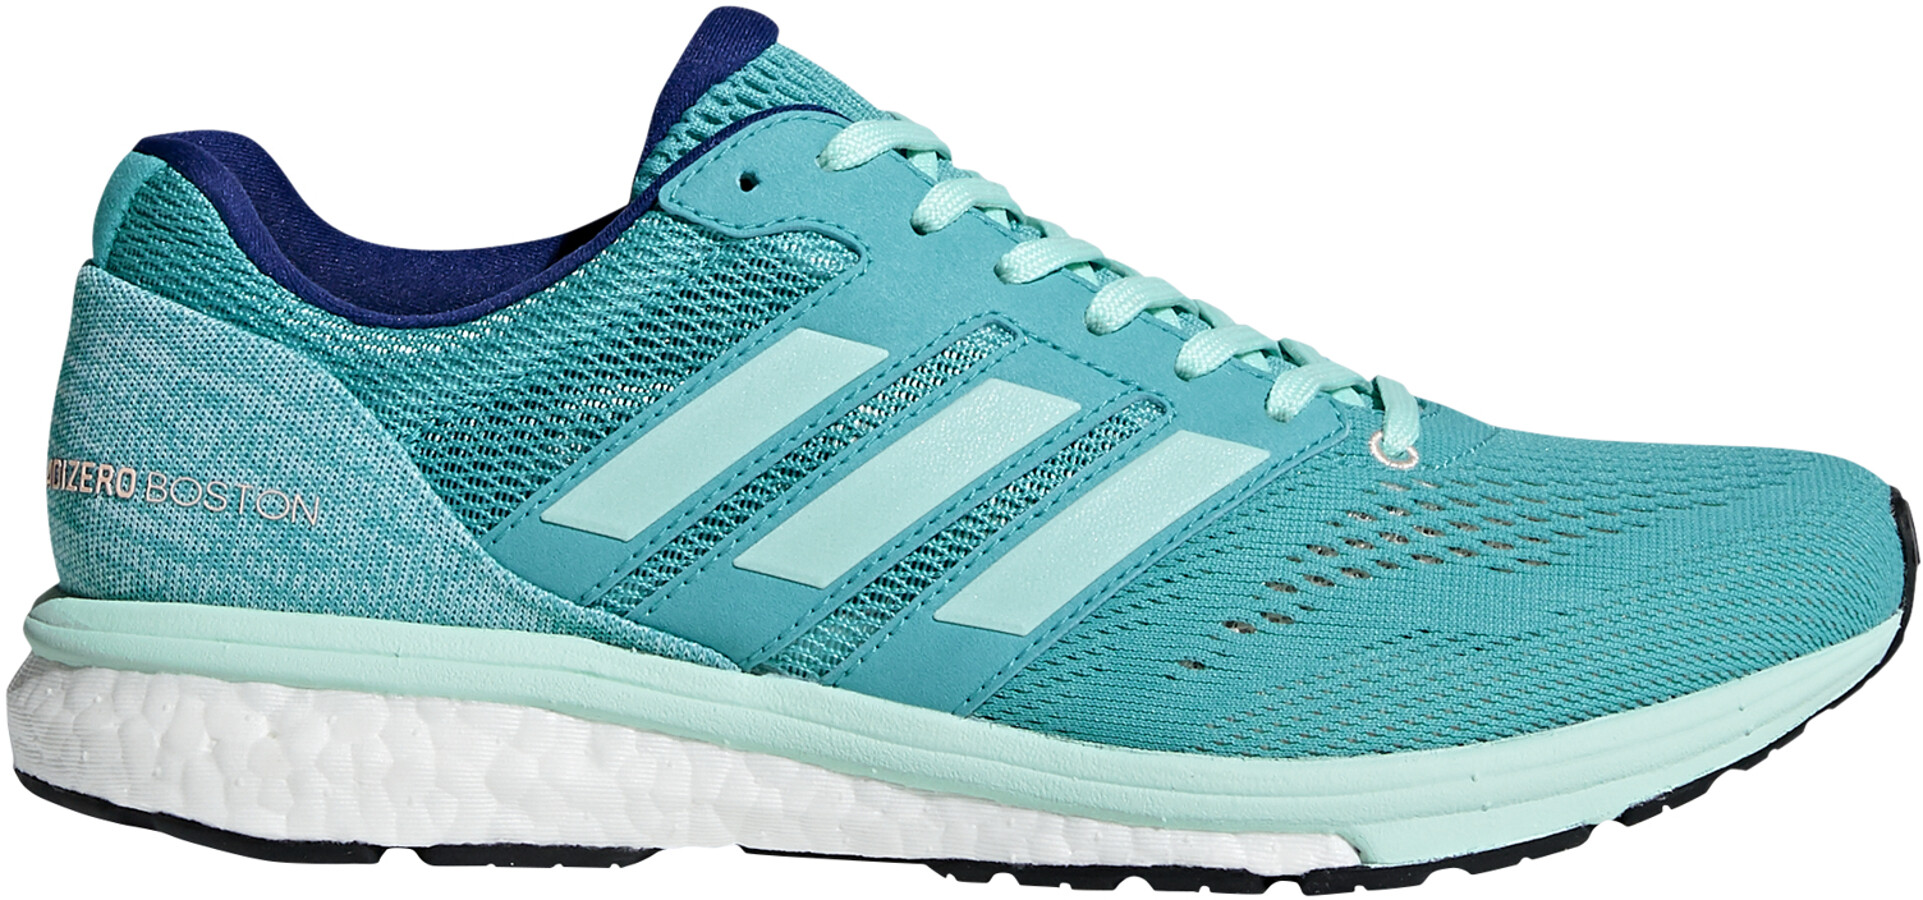 check out eae1e 3ebde adidas Adizero Boston 7 - Chaussures running Femme - turquoise